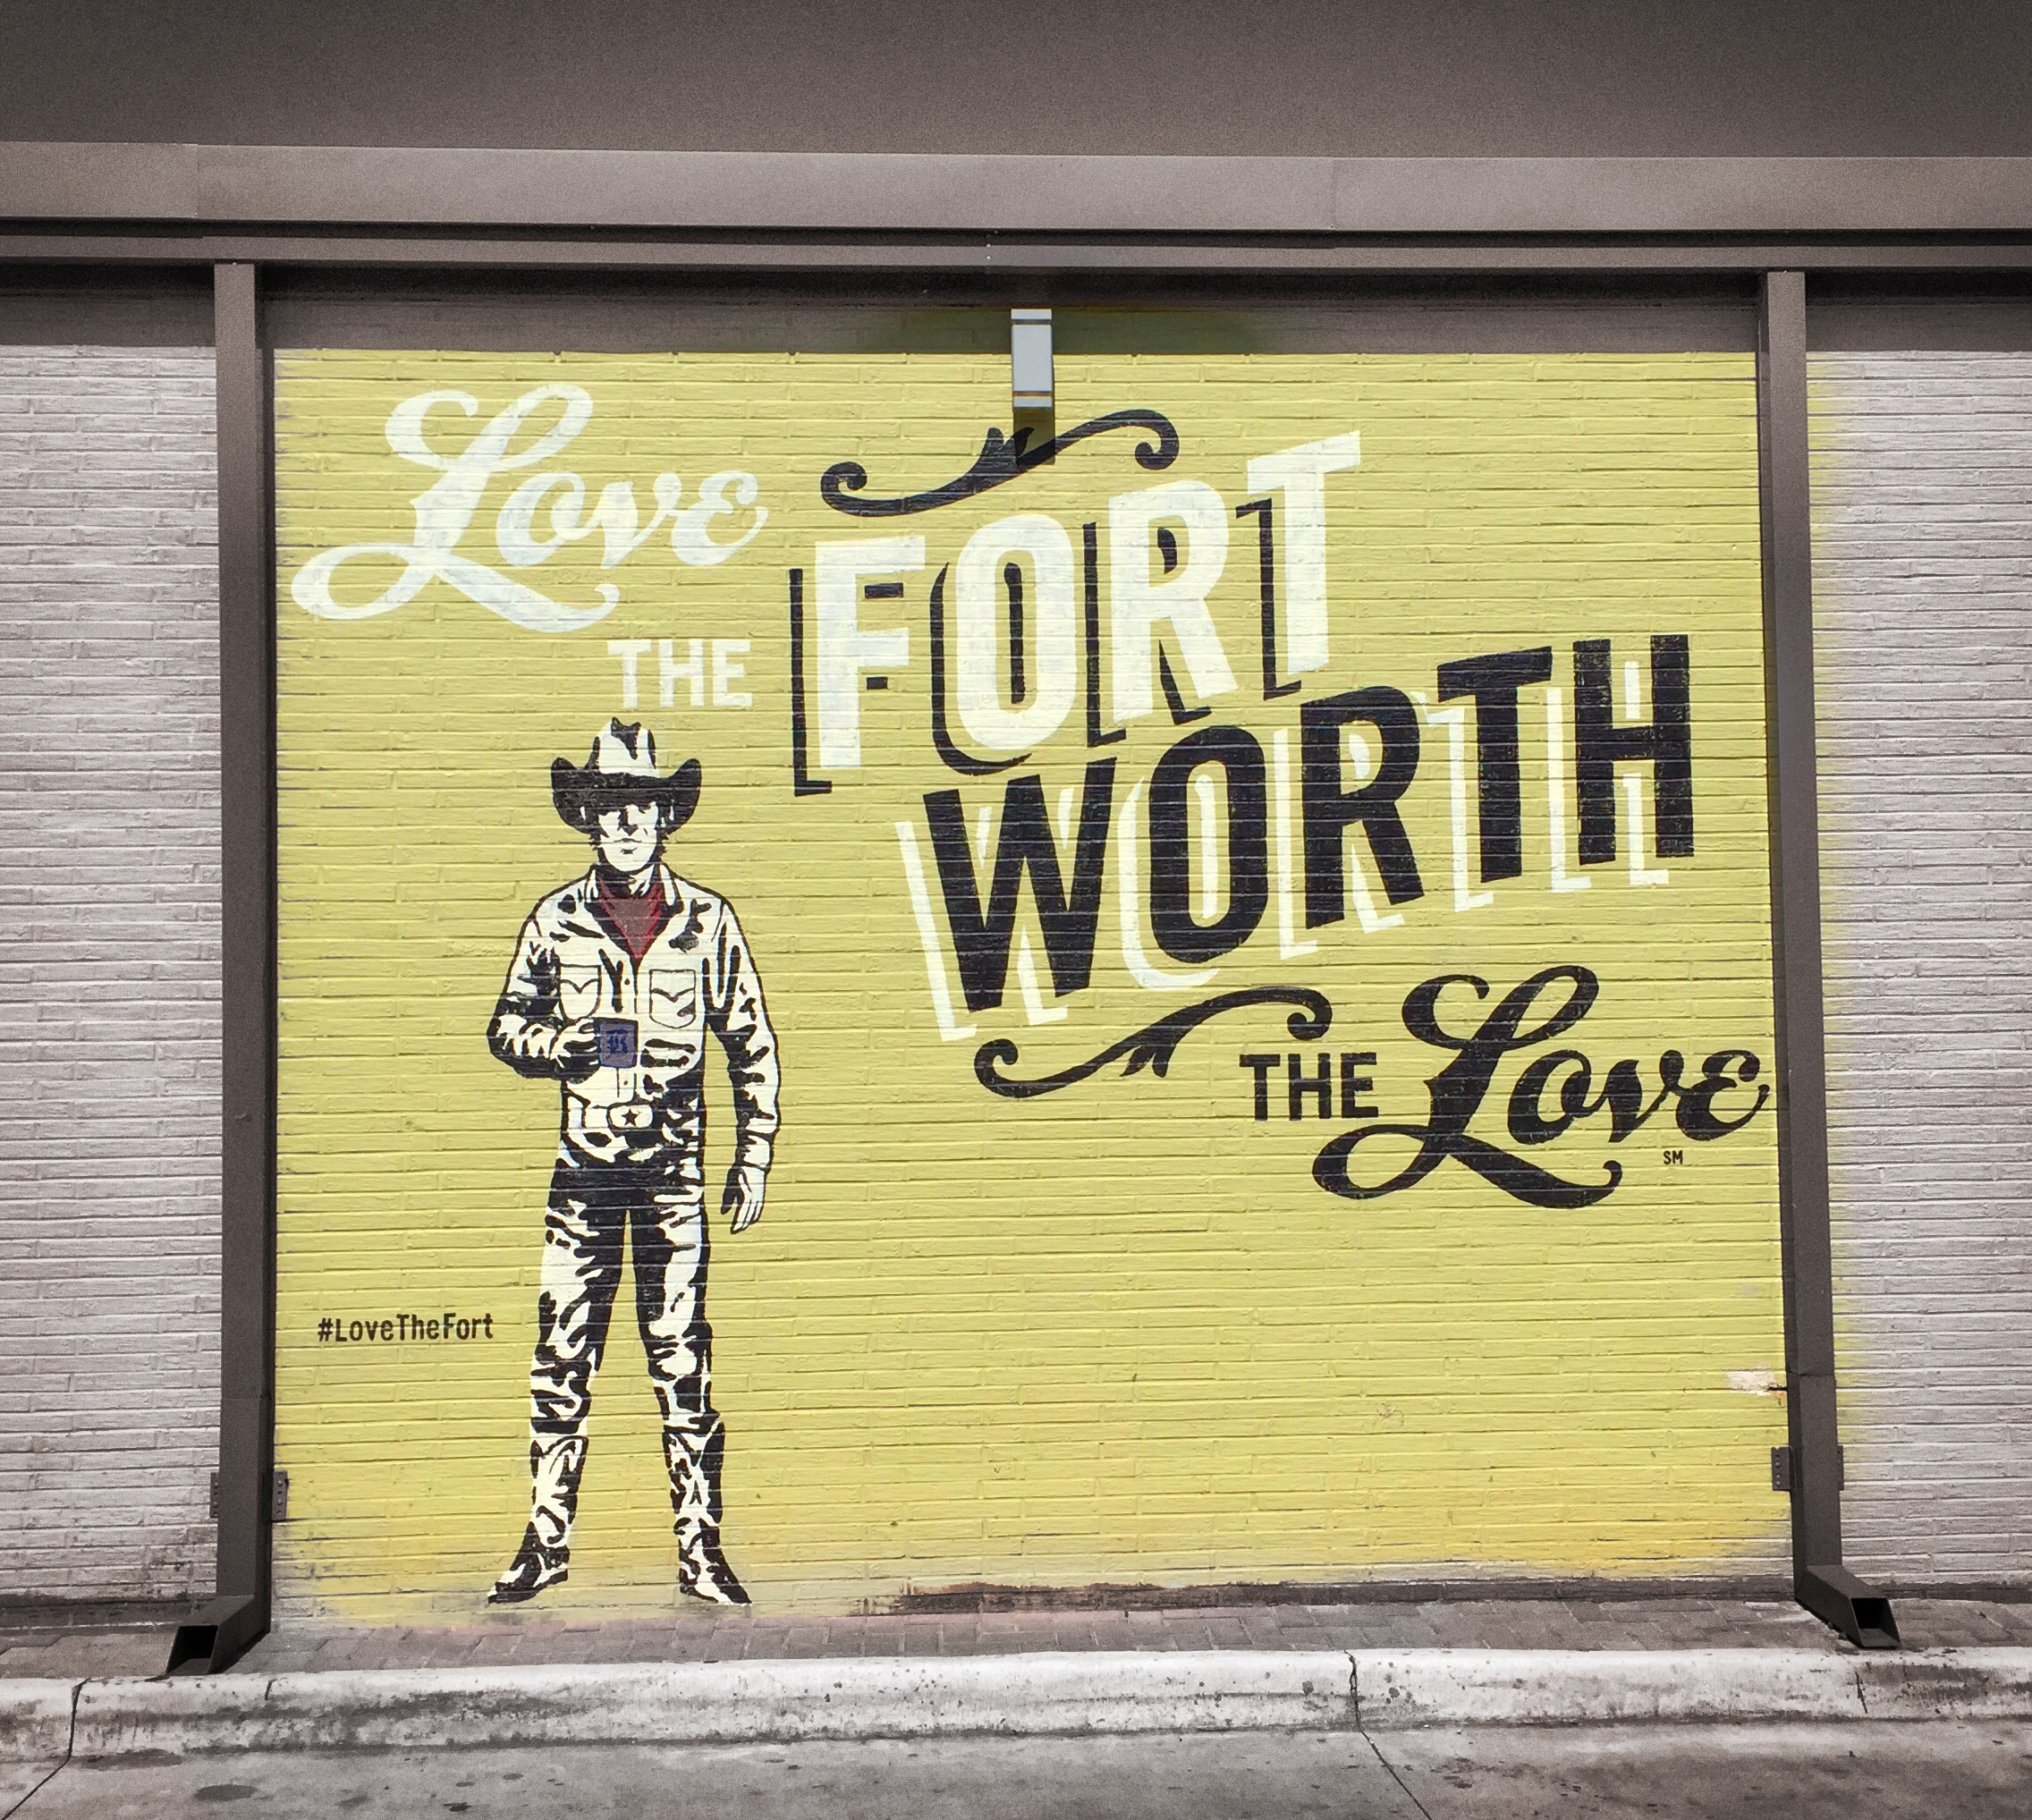 brewed-fort-worth-mural-love-the-fort-worth-love-walls-that-talk.jpb